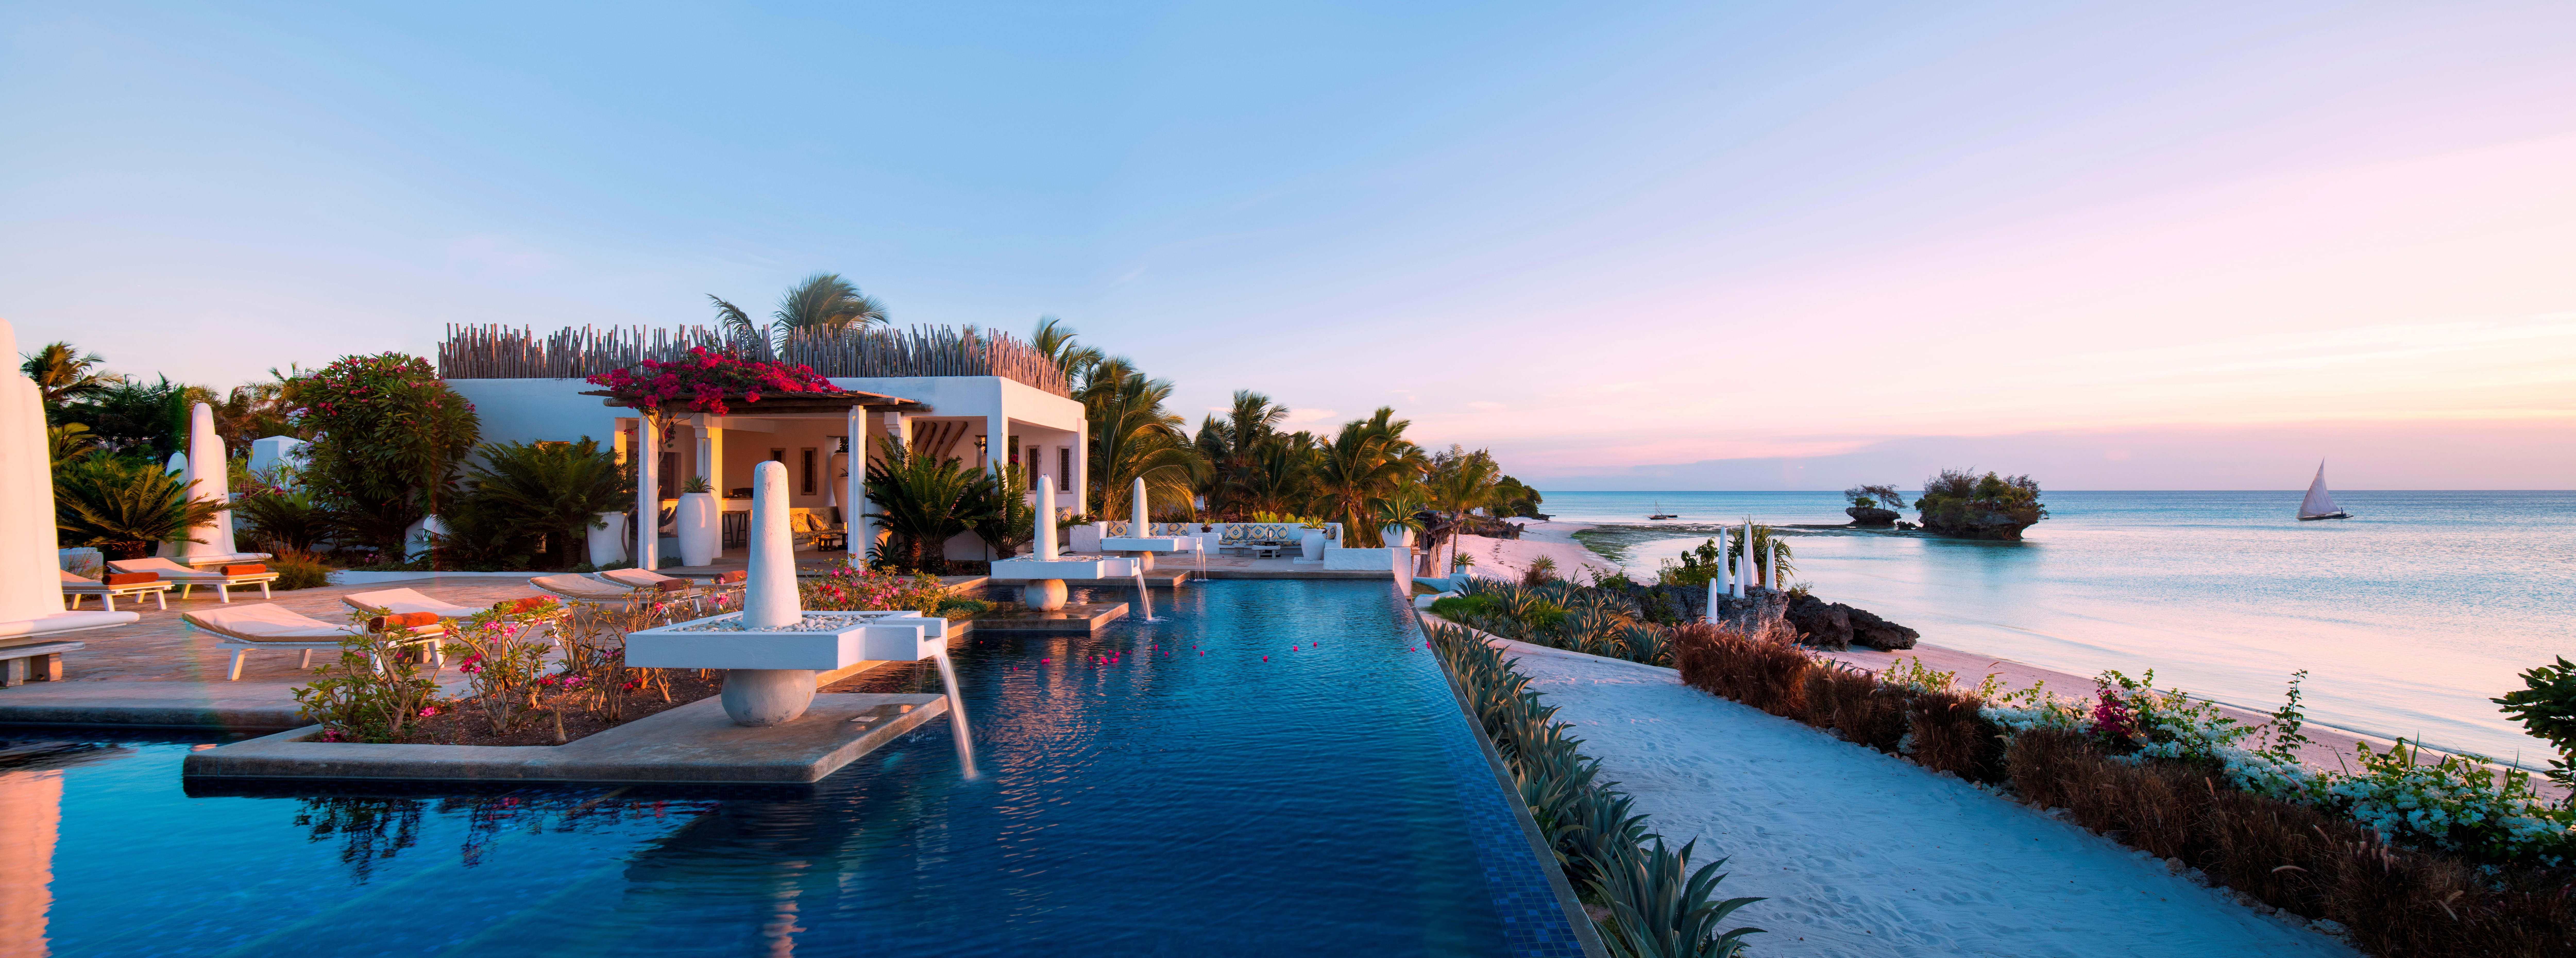 Constance-Aiyana-Pemba-Zanzibar-Pool